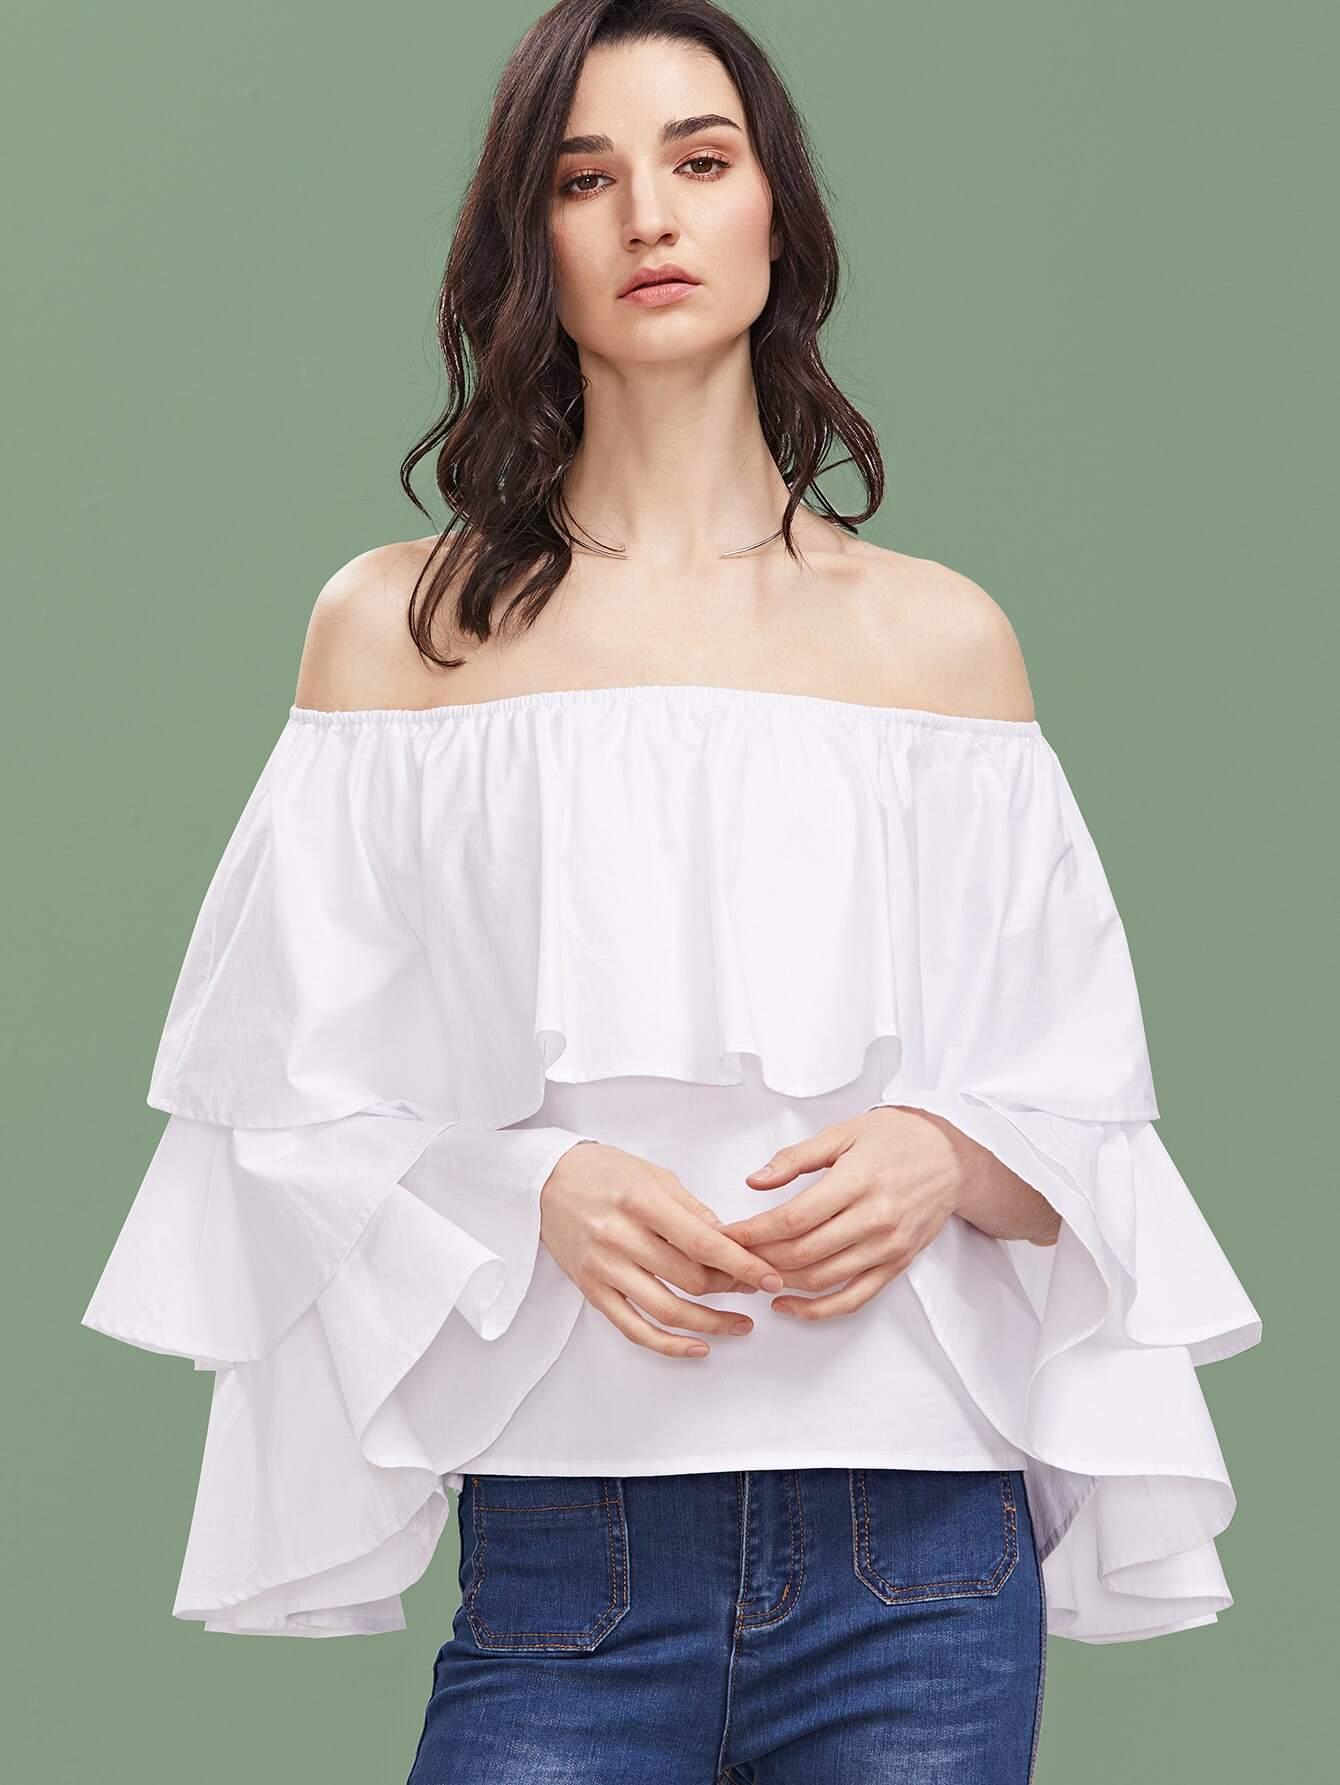 blouse161227703_2